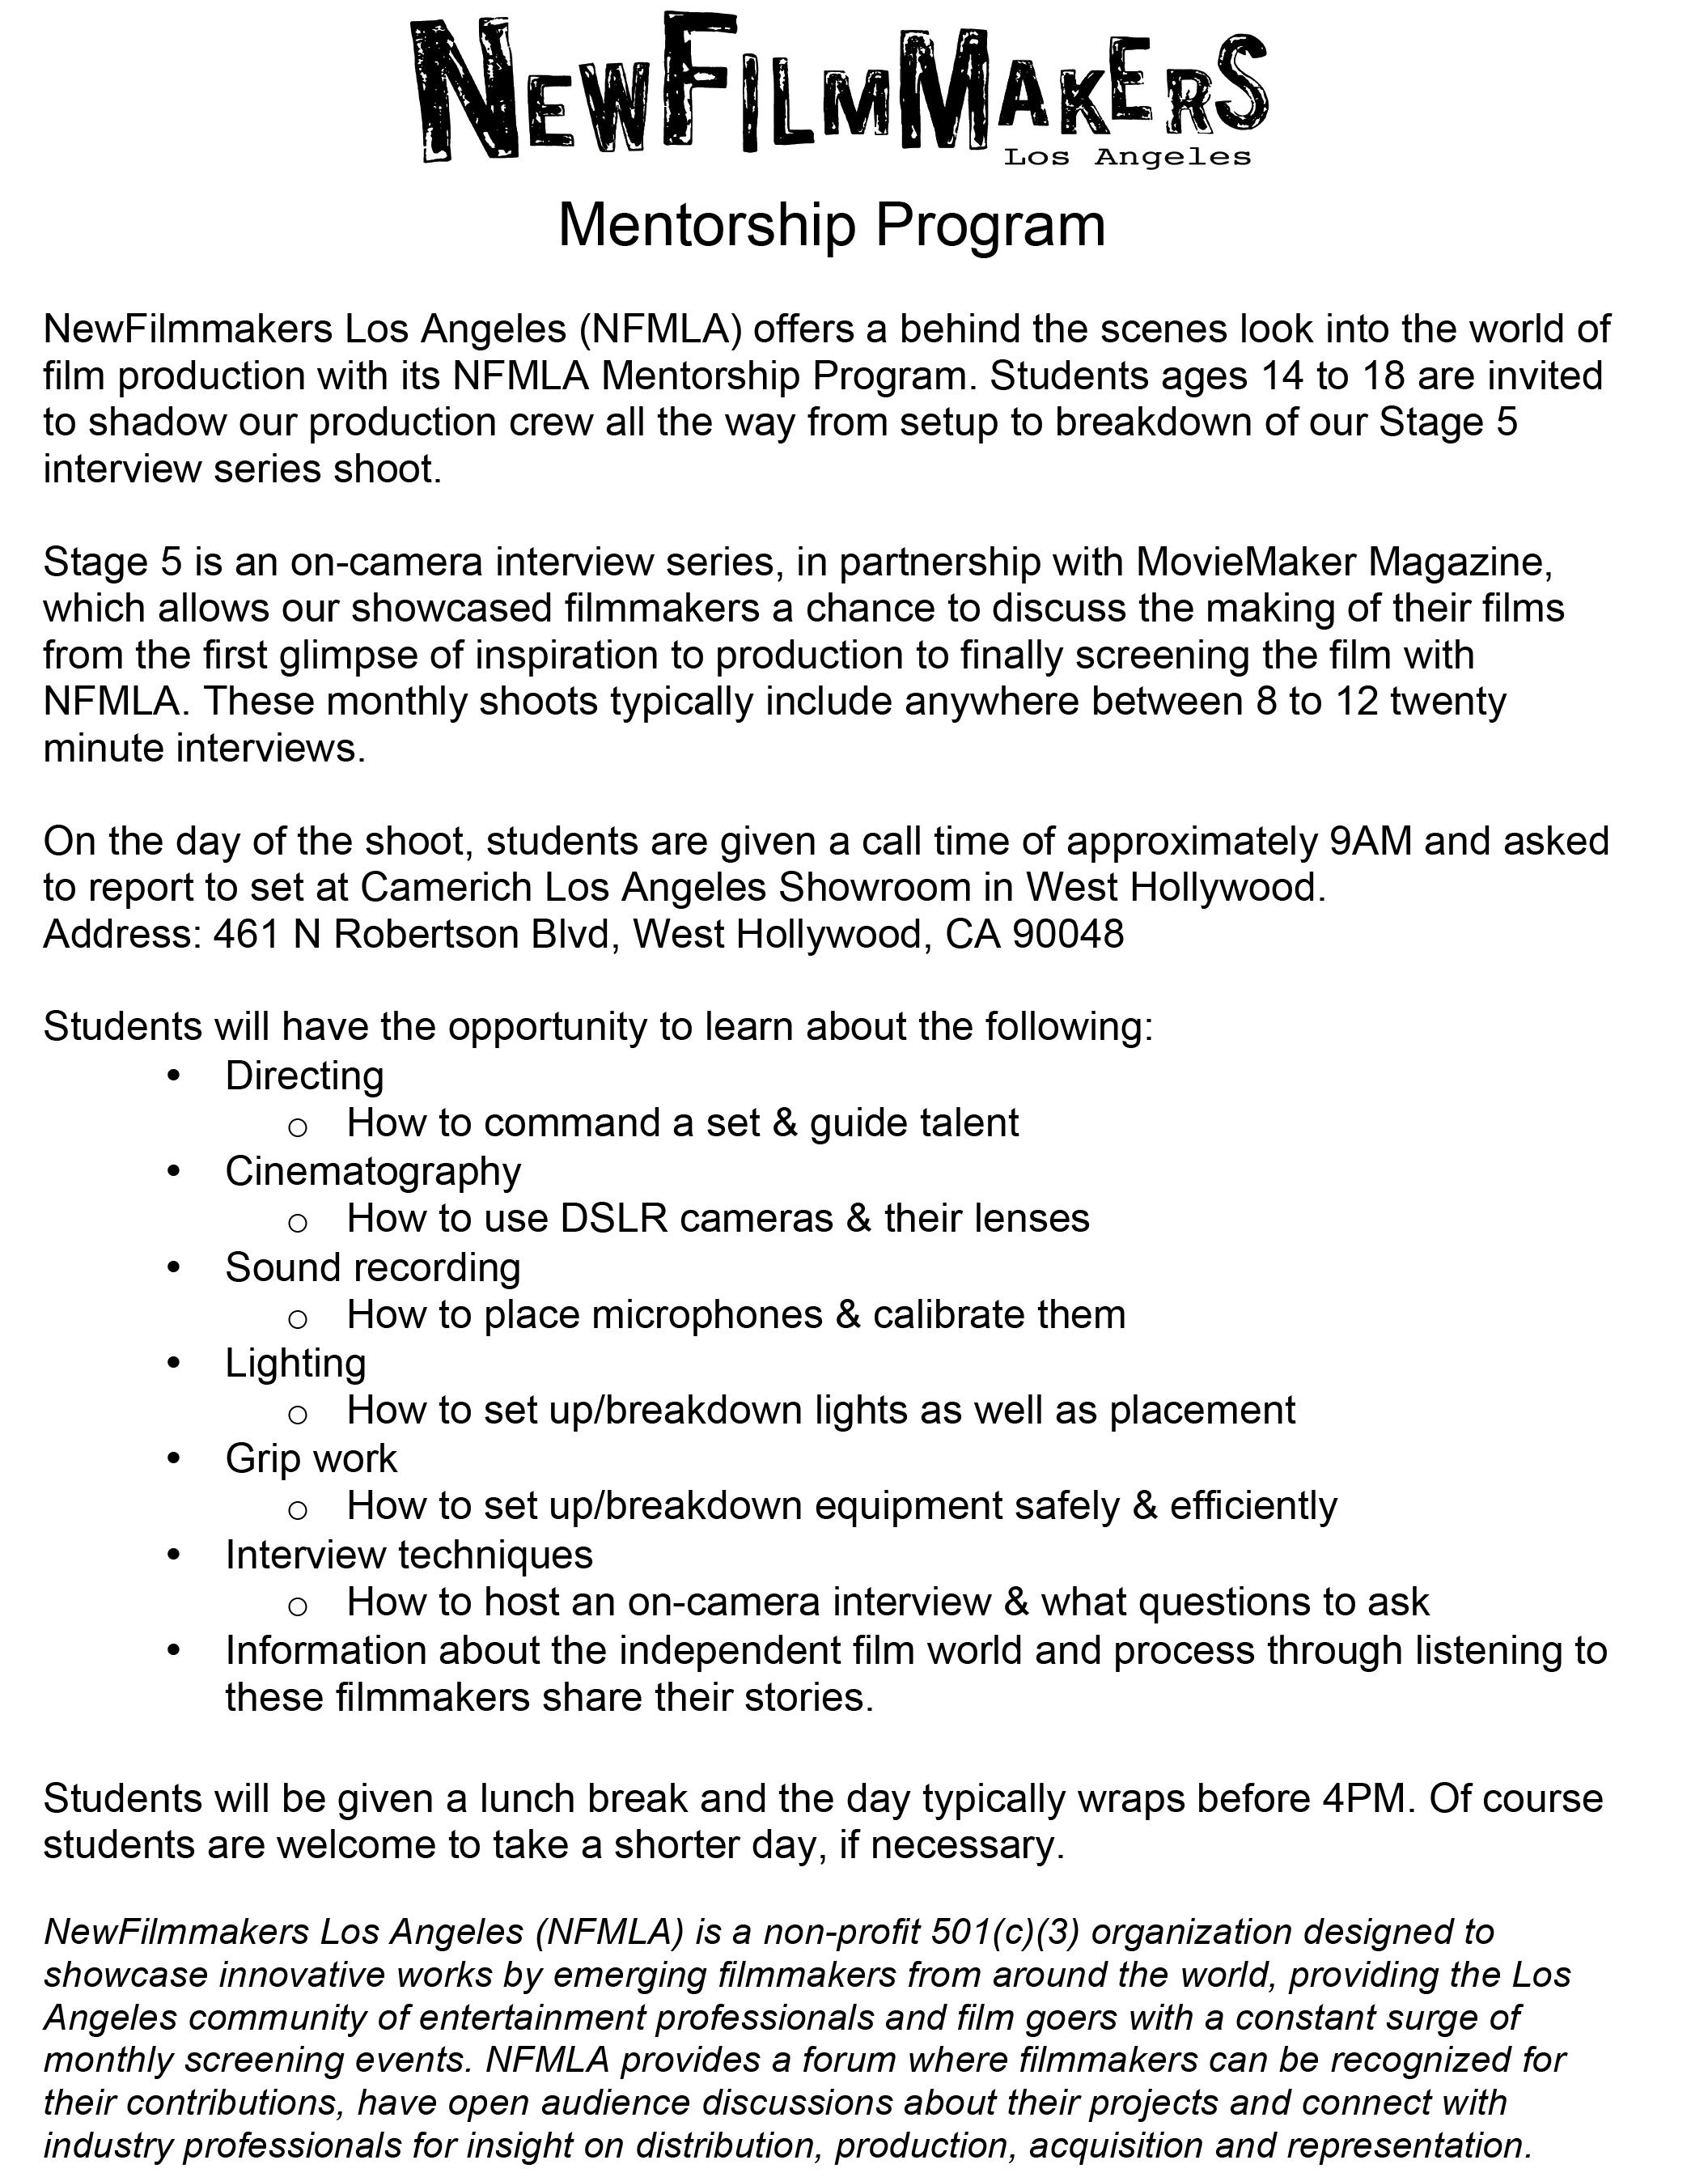 NFMLA_Mentorship_Program-3_(2).jpg